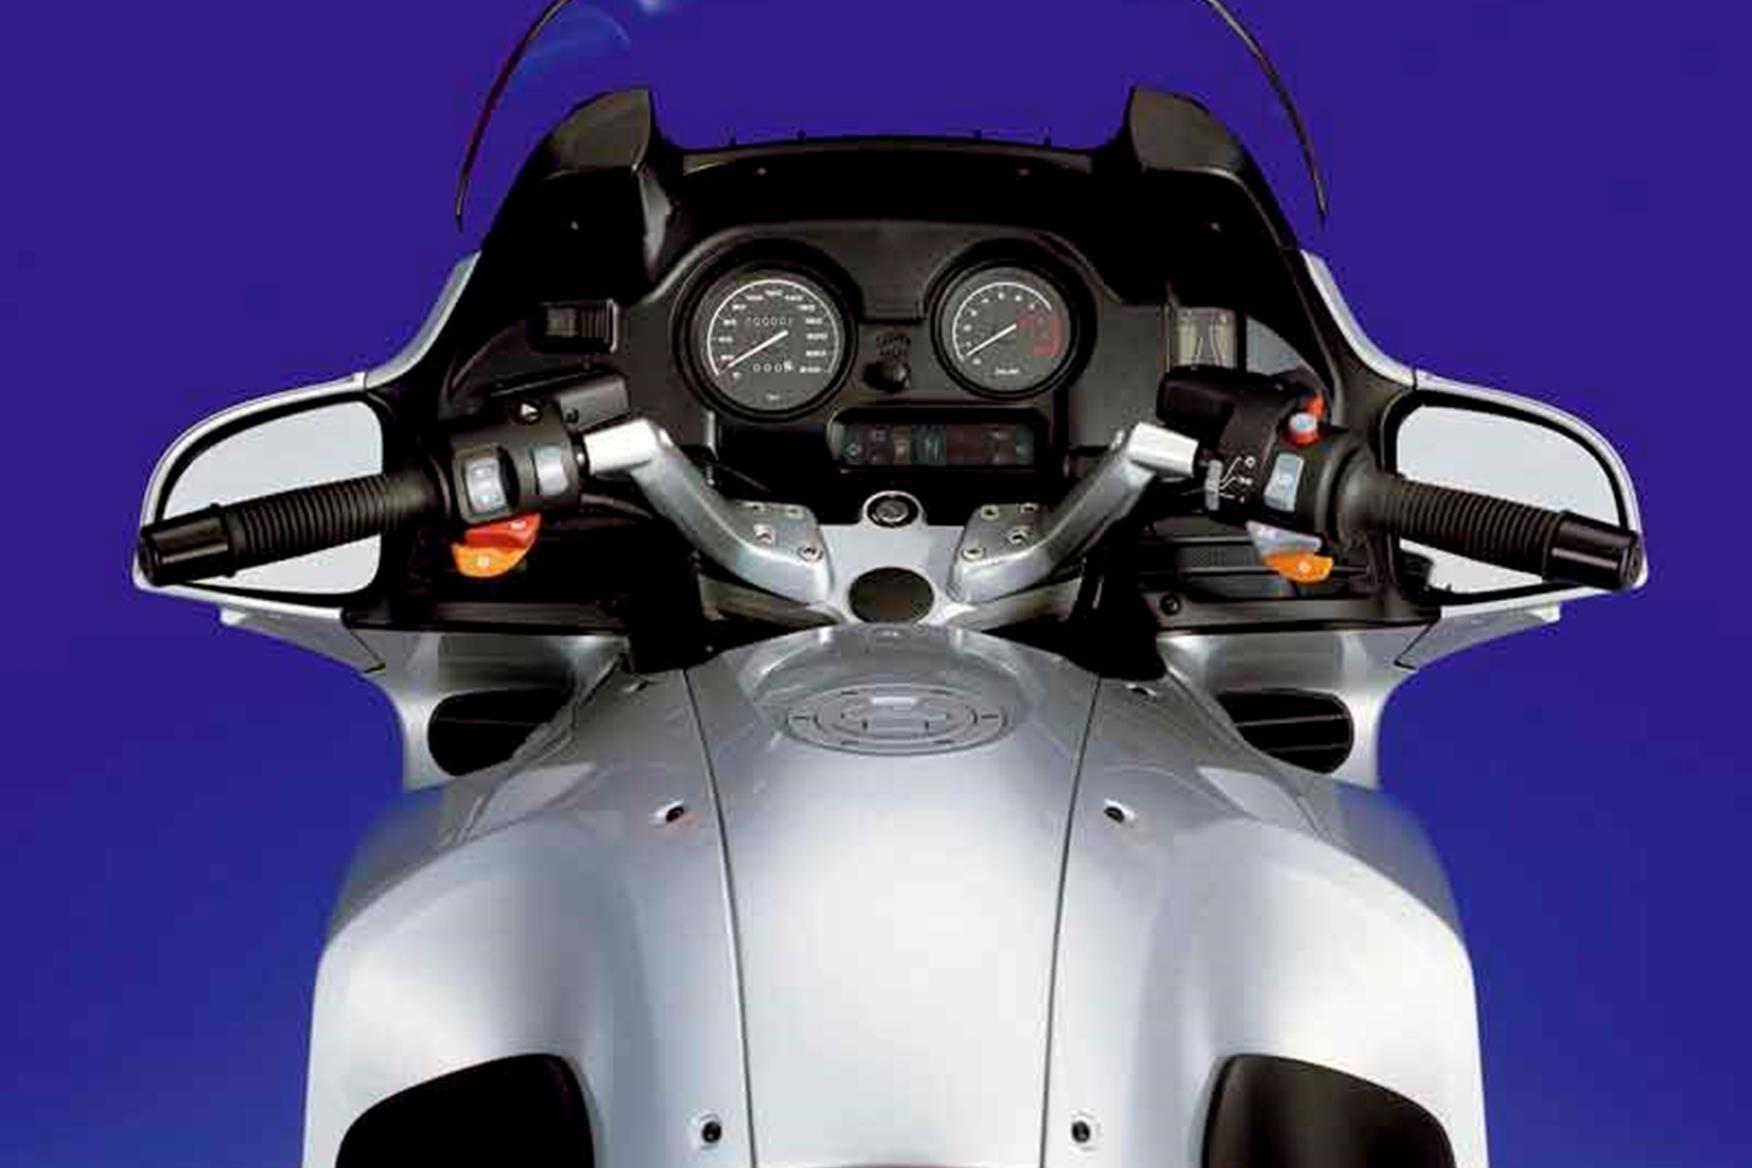 r1150rt engine diagram wiring diagrams base BMW R1150RT Review bmw r1100rt 2001 engine diagram wiring diagram library bmw r1150rt road test bmw r1150rt engine diagram